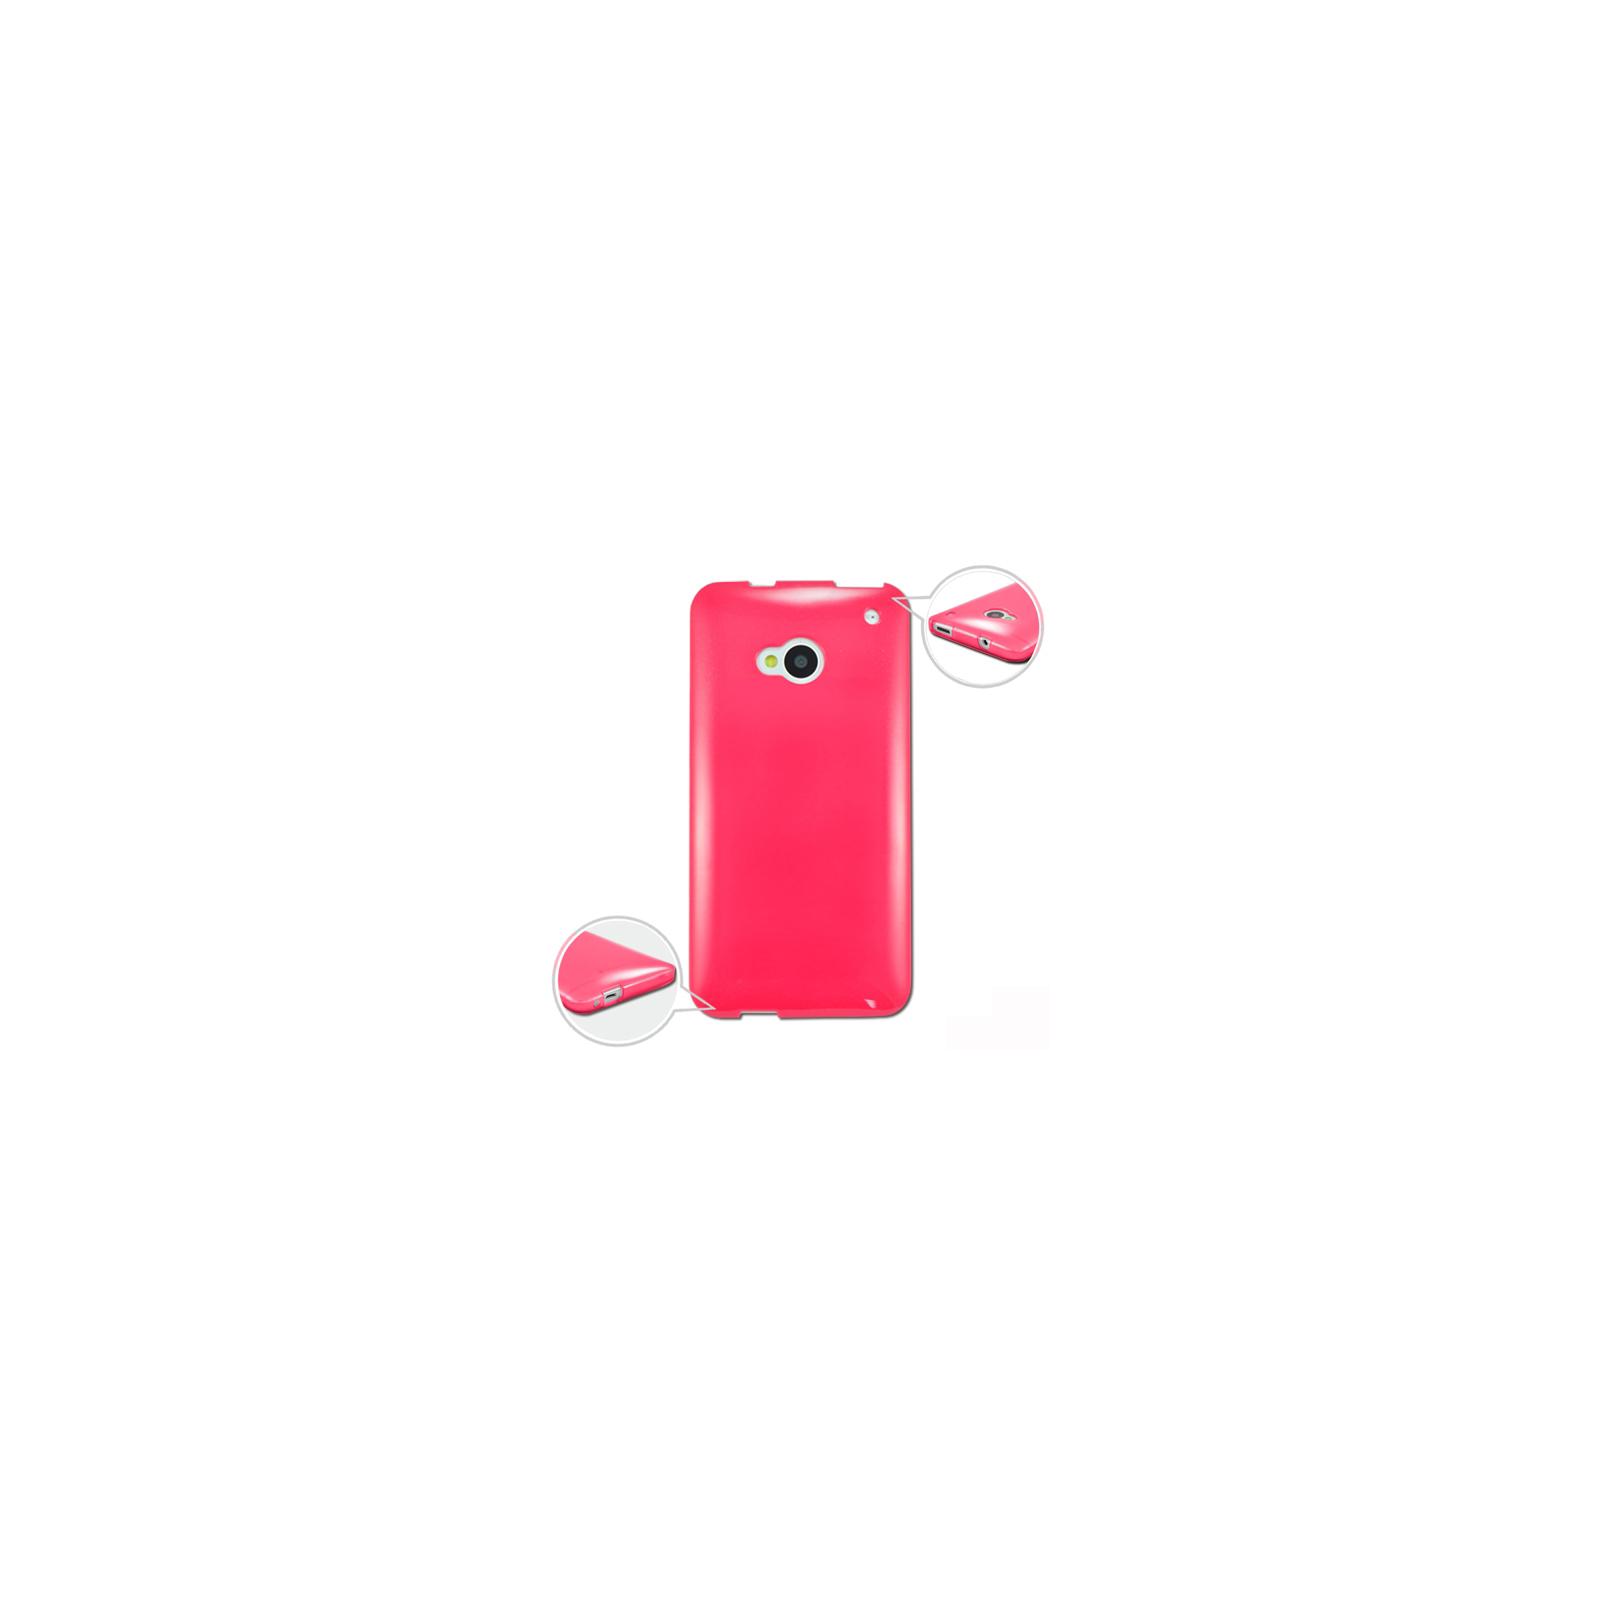 Чехол для моб. телефона Simply Design HTC ONE /TPU Red (SD-9647)